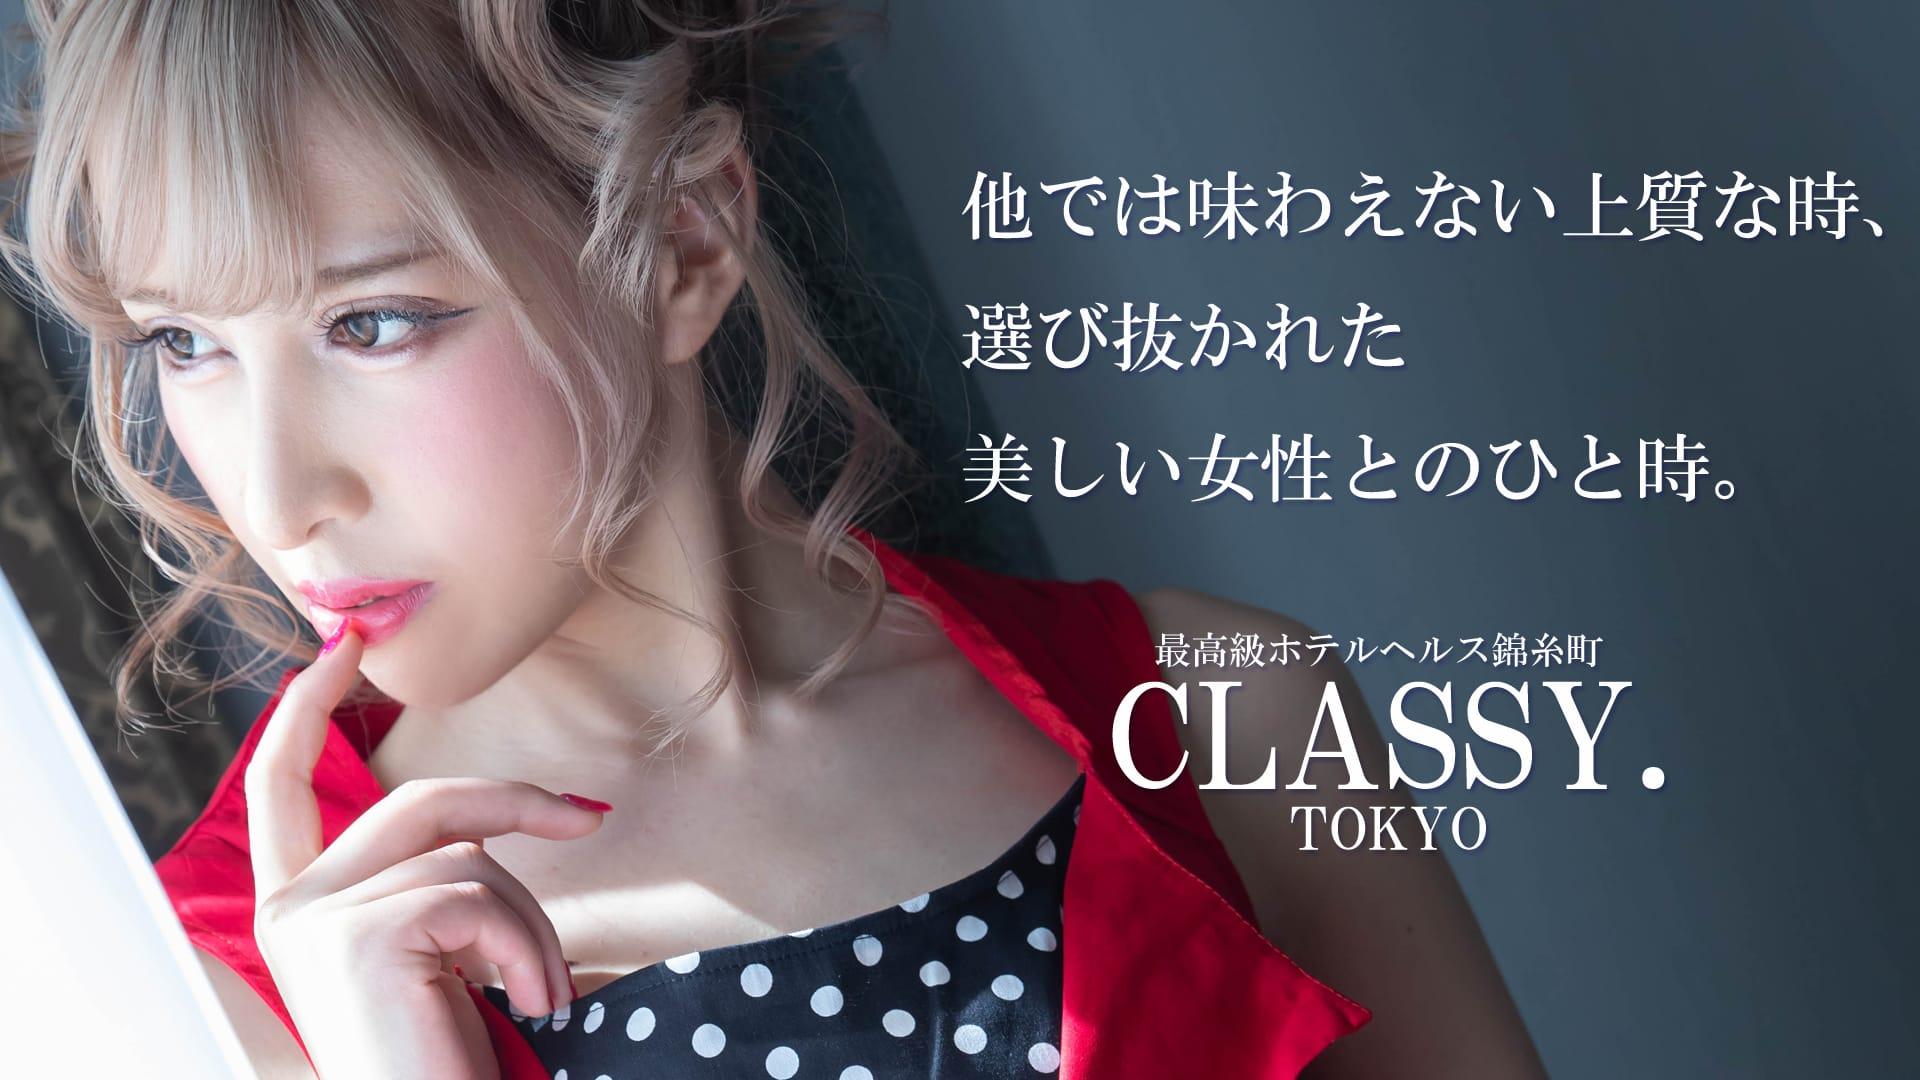 CLASSY.東京・錦糸町店メイン画像